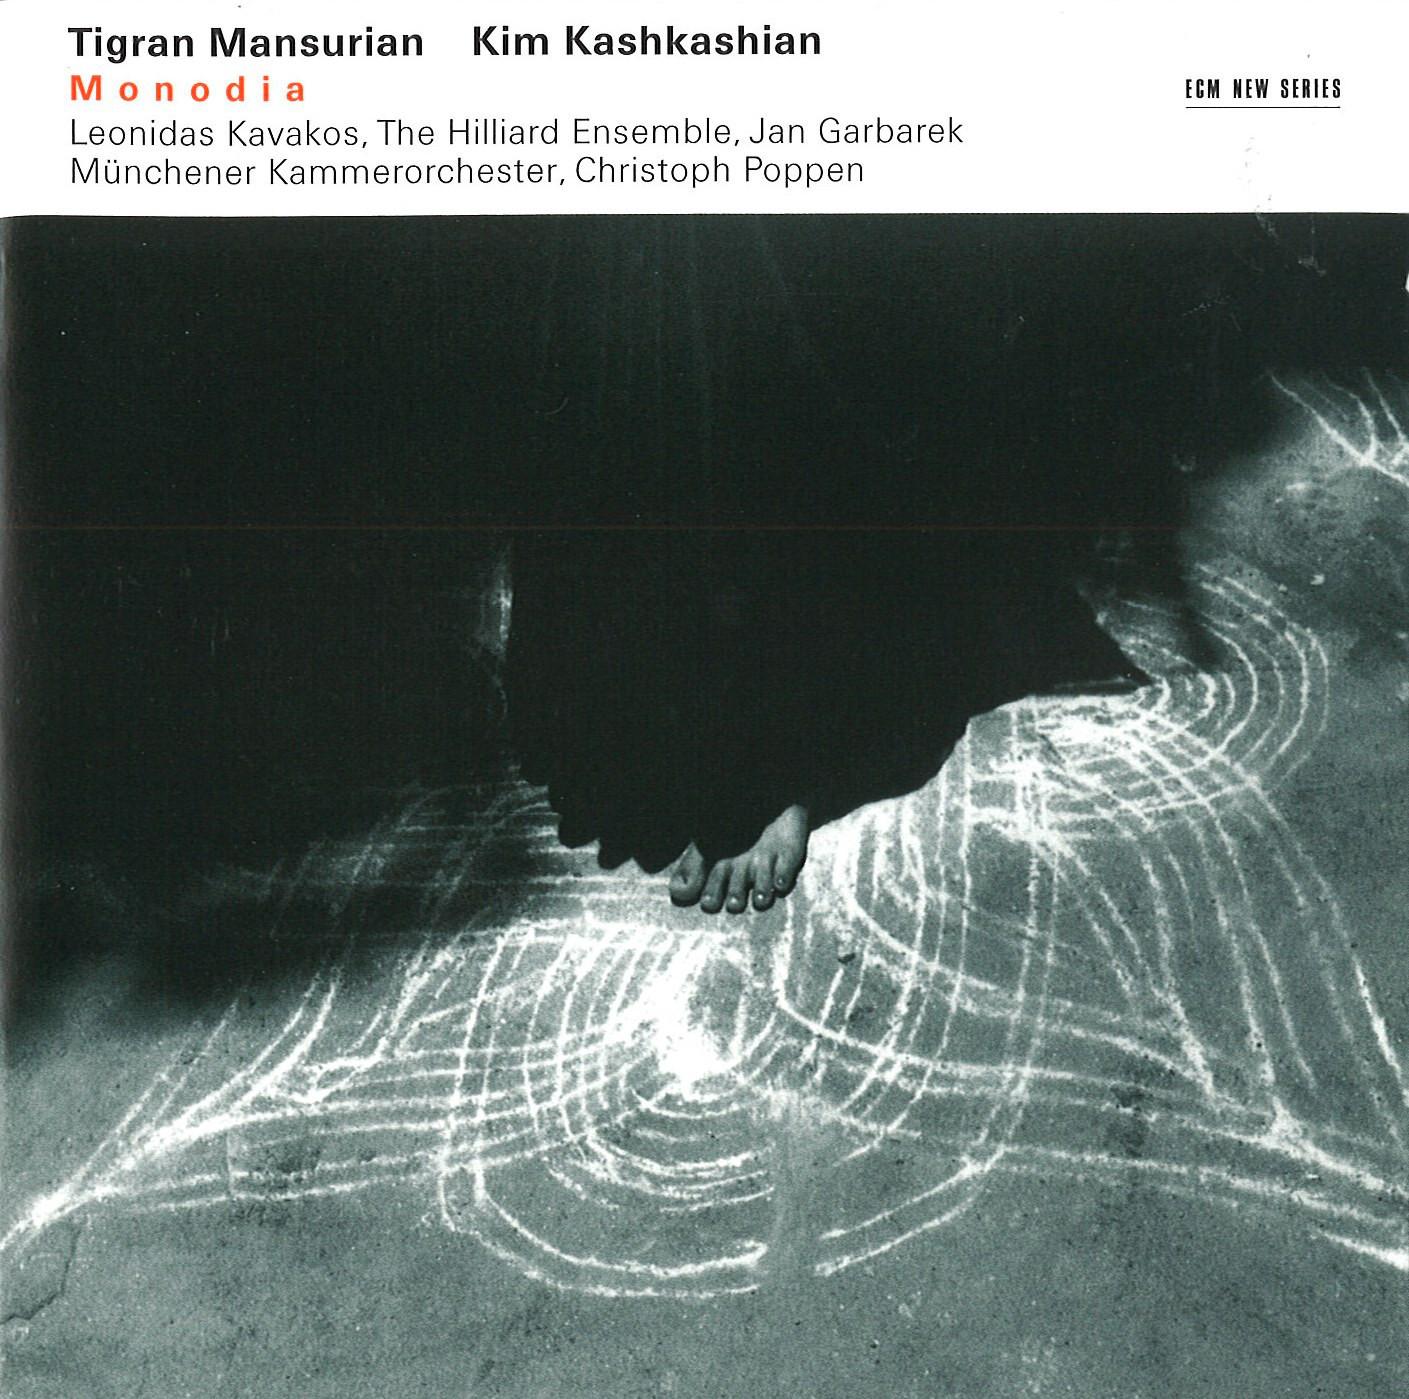 ECM Münchener Kammerorchester Tigran Mansurian Monodia